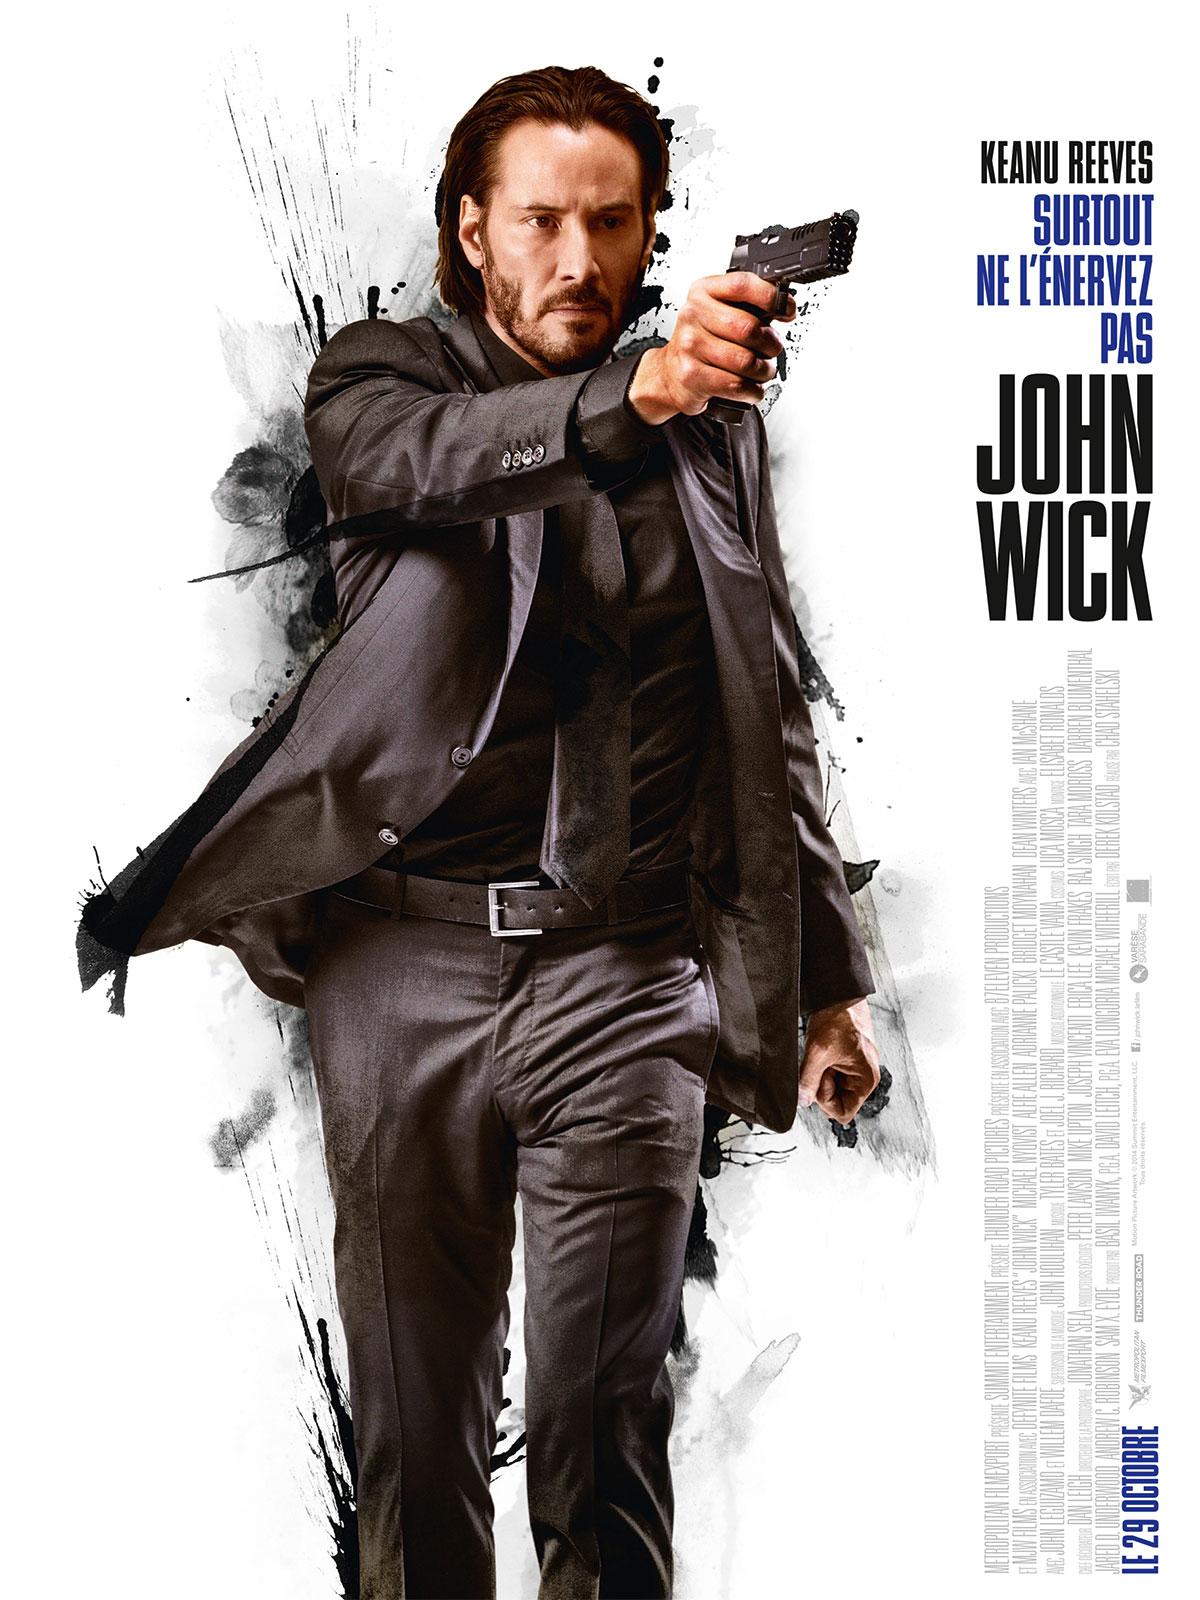 Nonton John Wick (2014) Subtitle Indonesia | Cinema 21